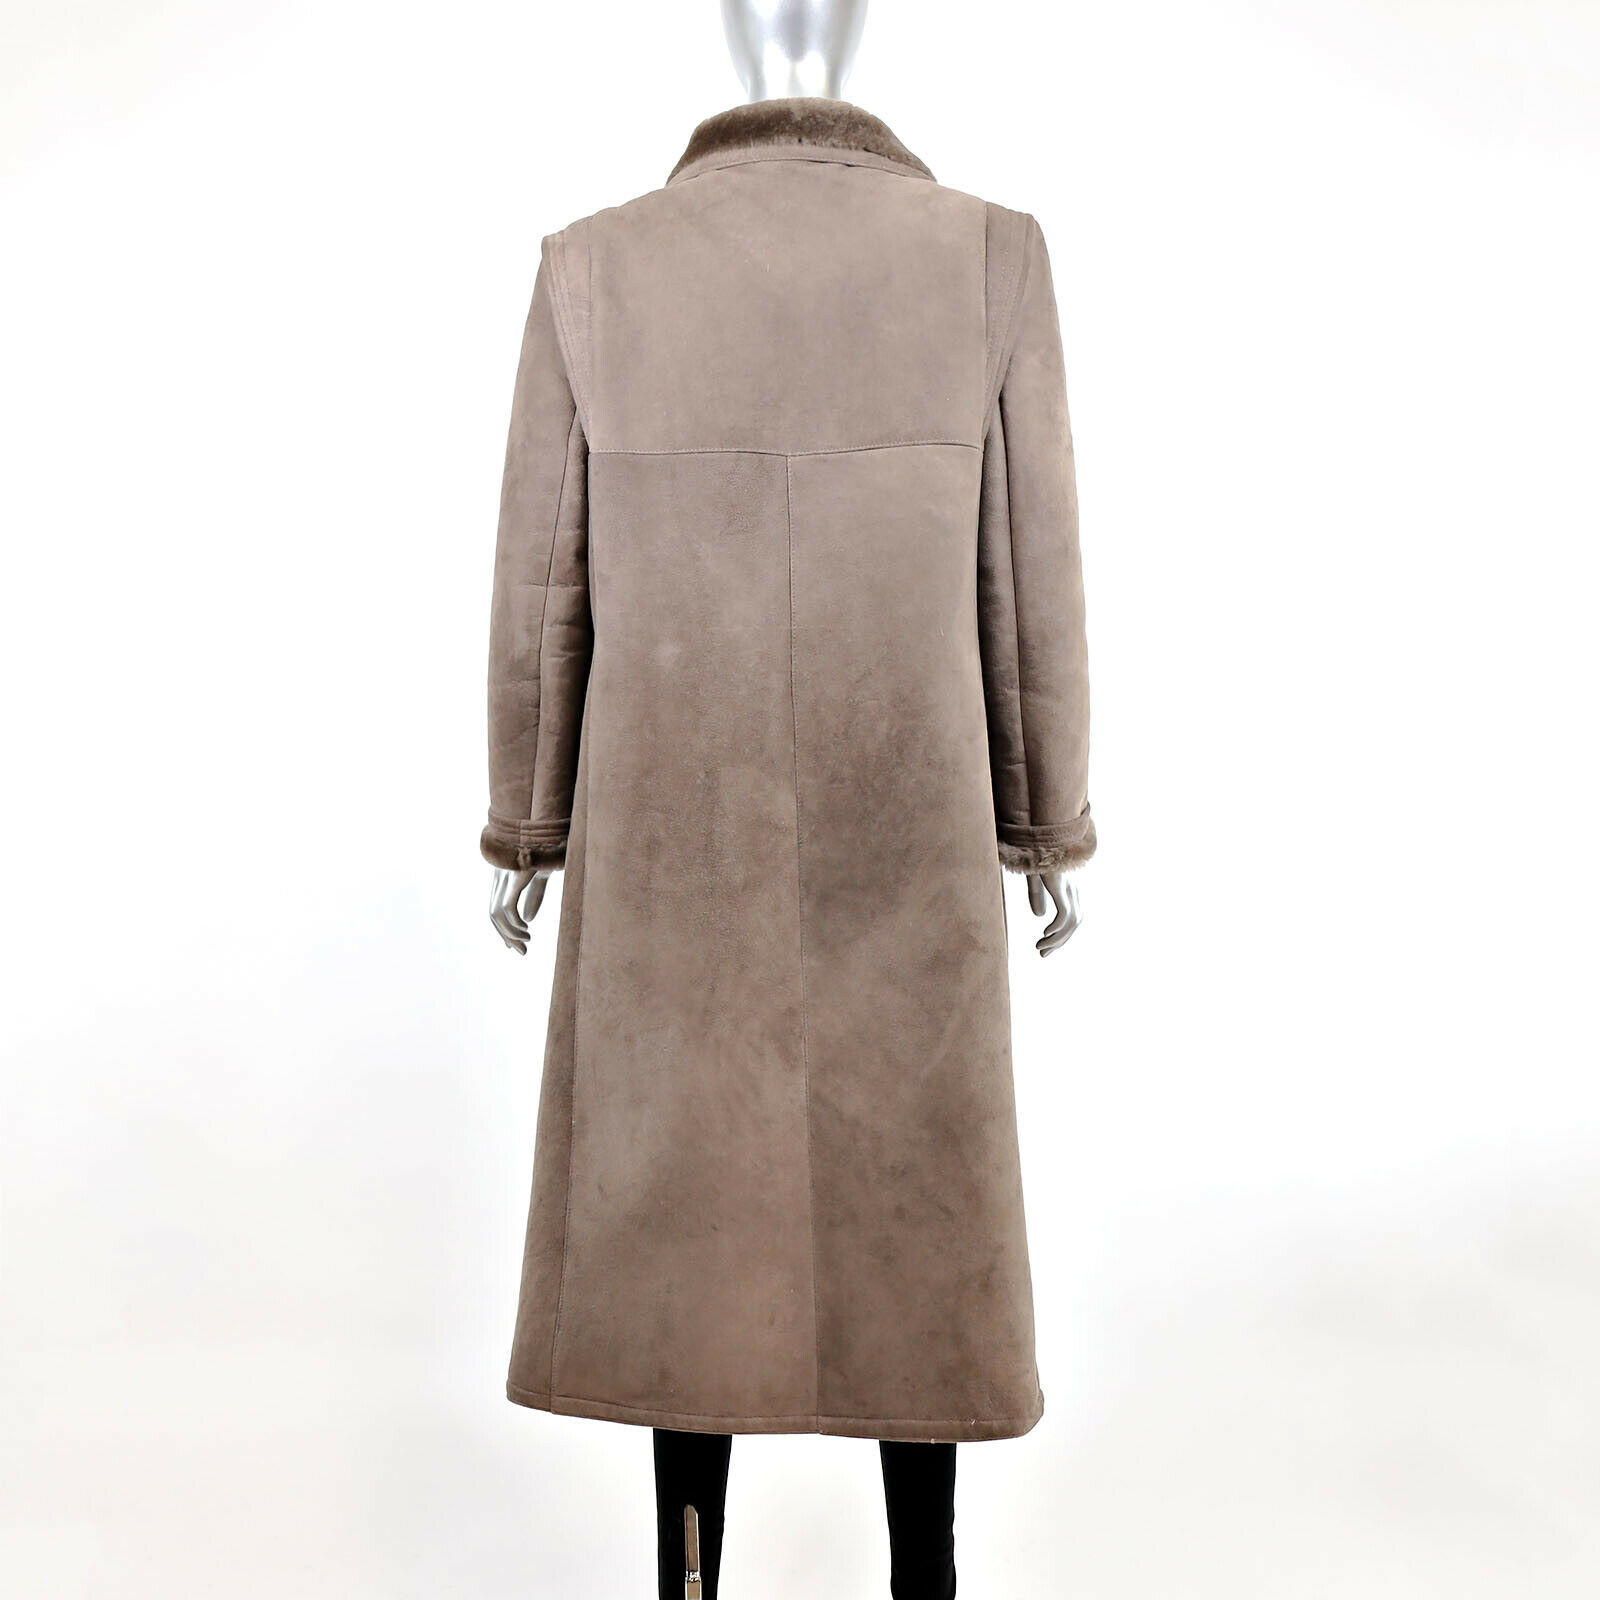 Full Length Shearling Coat- Size M-L (Vintage Fur… - image 4